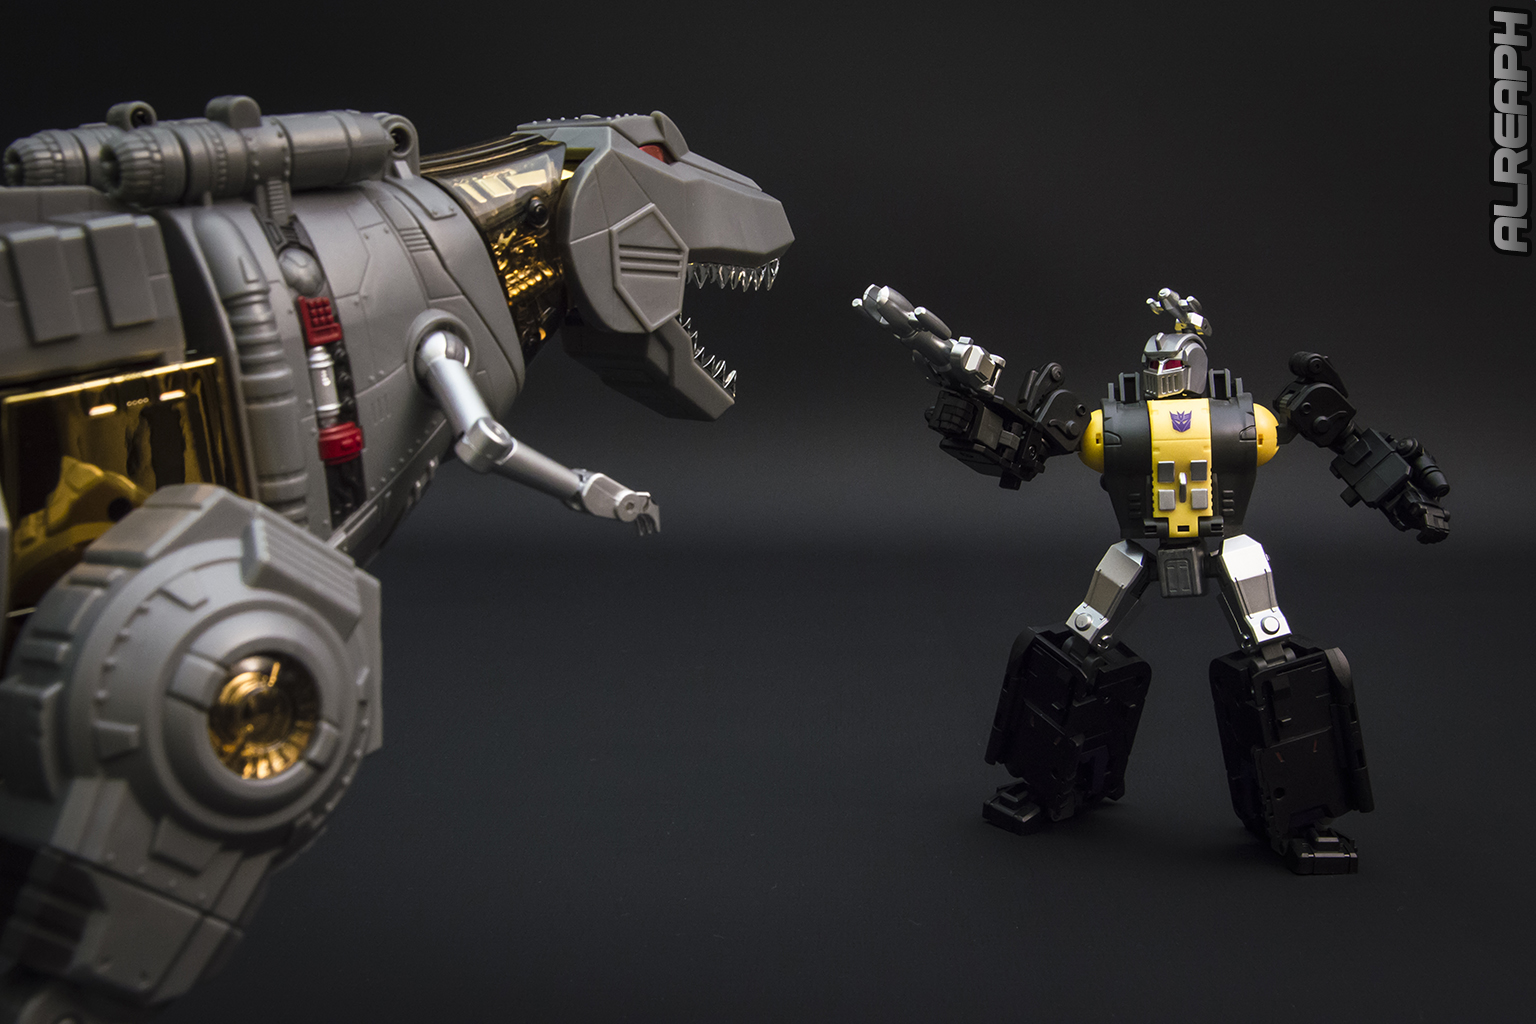 [Fanstoys] Produit Tiers - Dinobots - FT-04 Scoria, FT-05 Soar, FT-06 Sever, FT-07 Stomp, FT-08 Grinder - Page 12 AHPmAq0Y